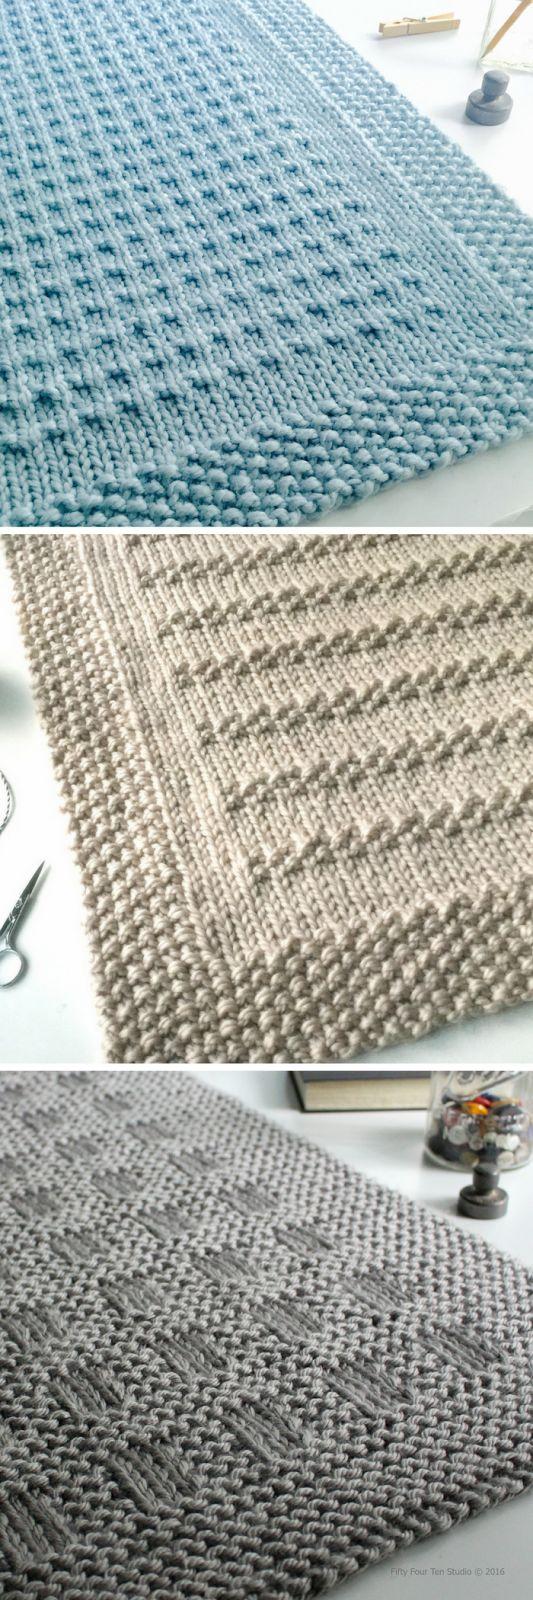 3+easy+blanket+patterns+2016.png (533×1600)